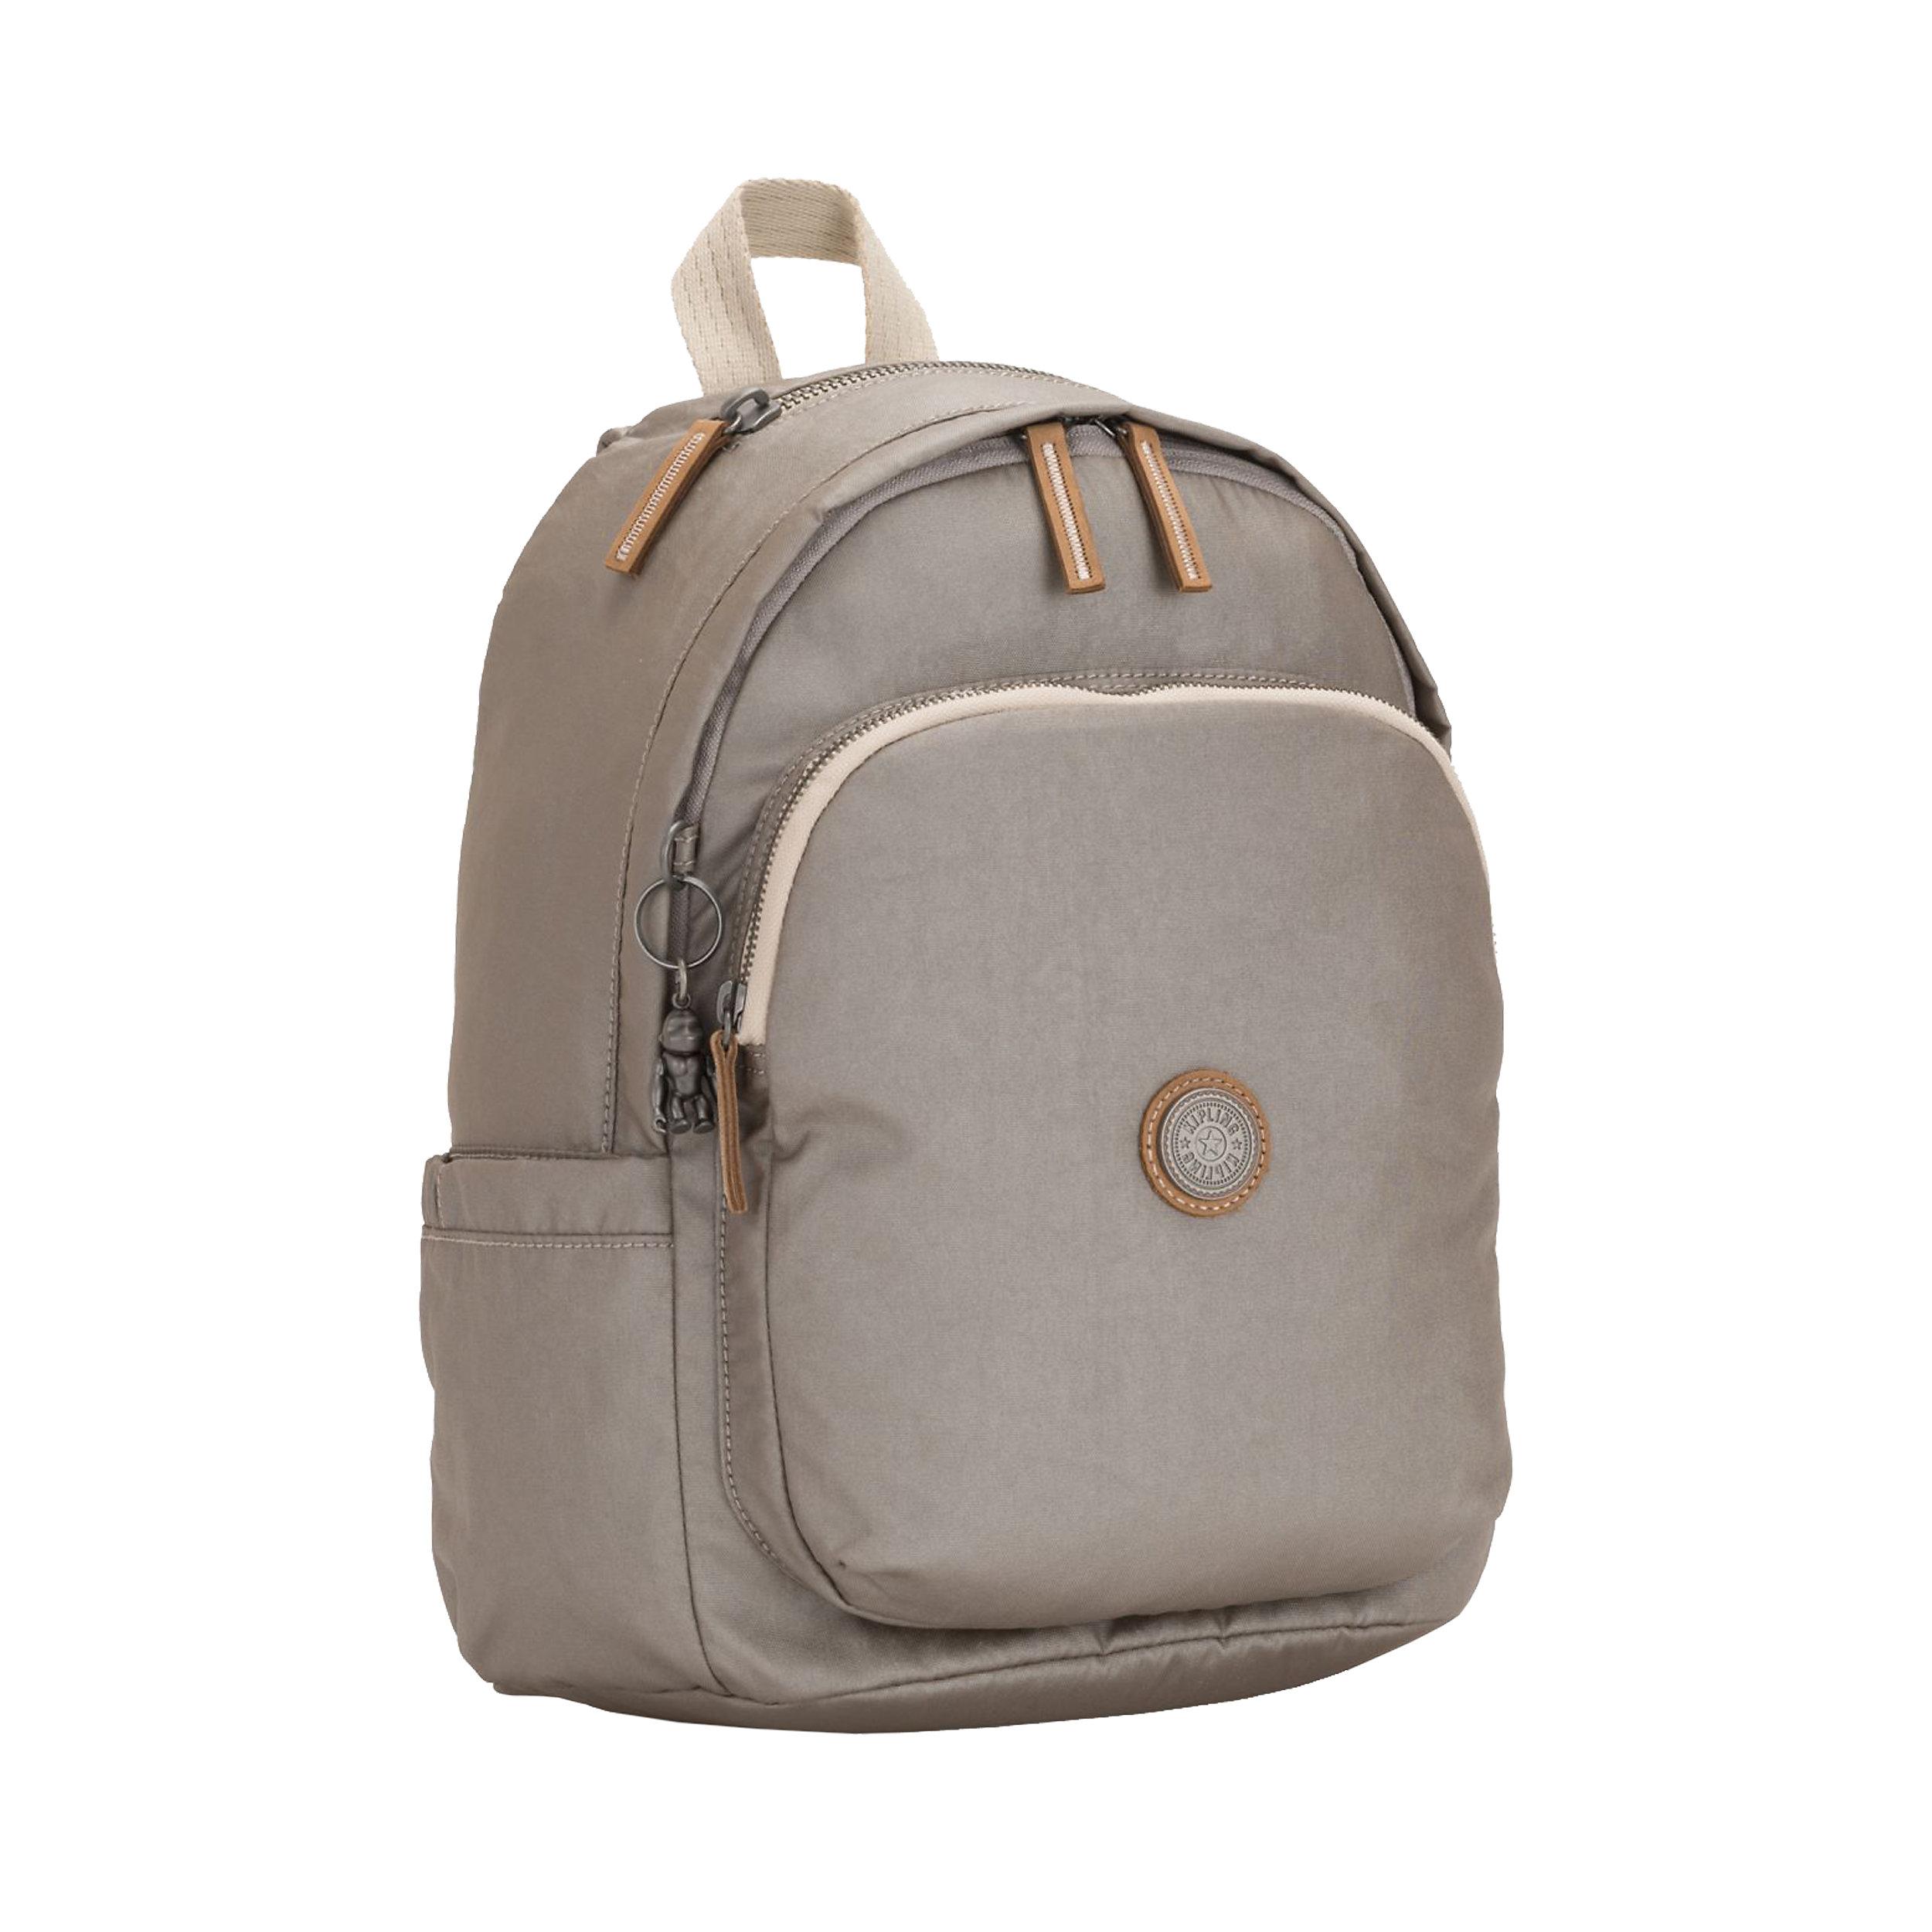 Backpack Delia M Edgeland + 16 Liter